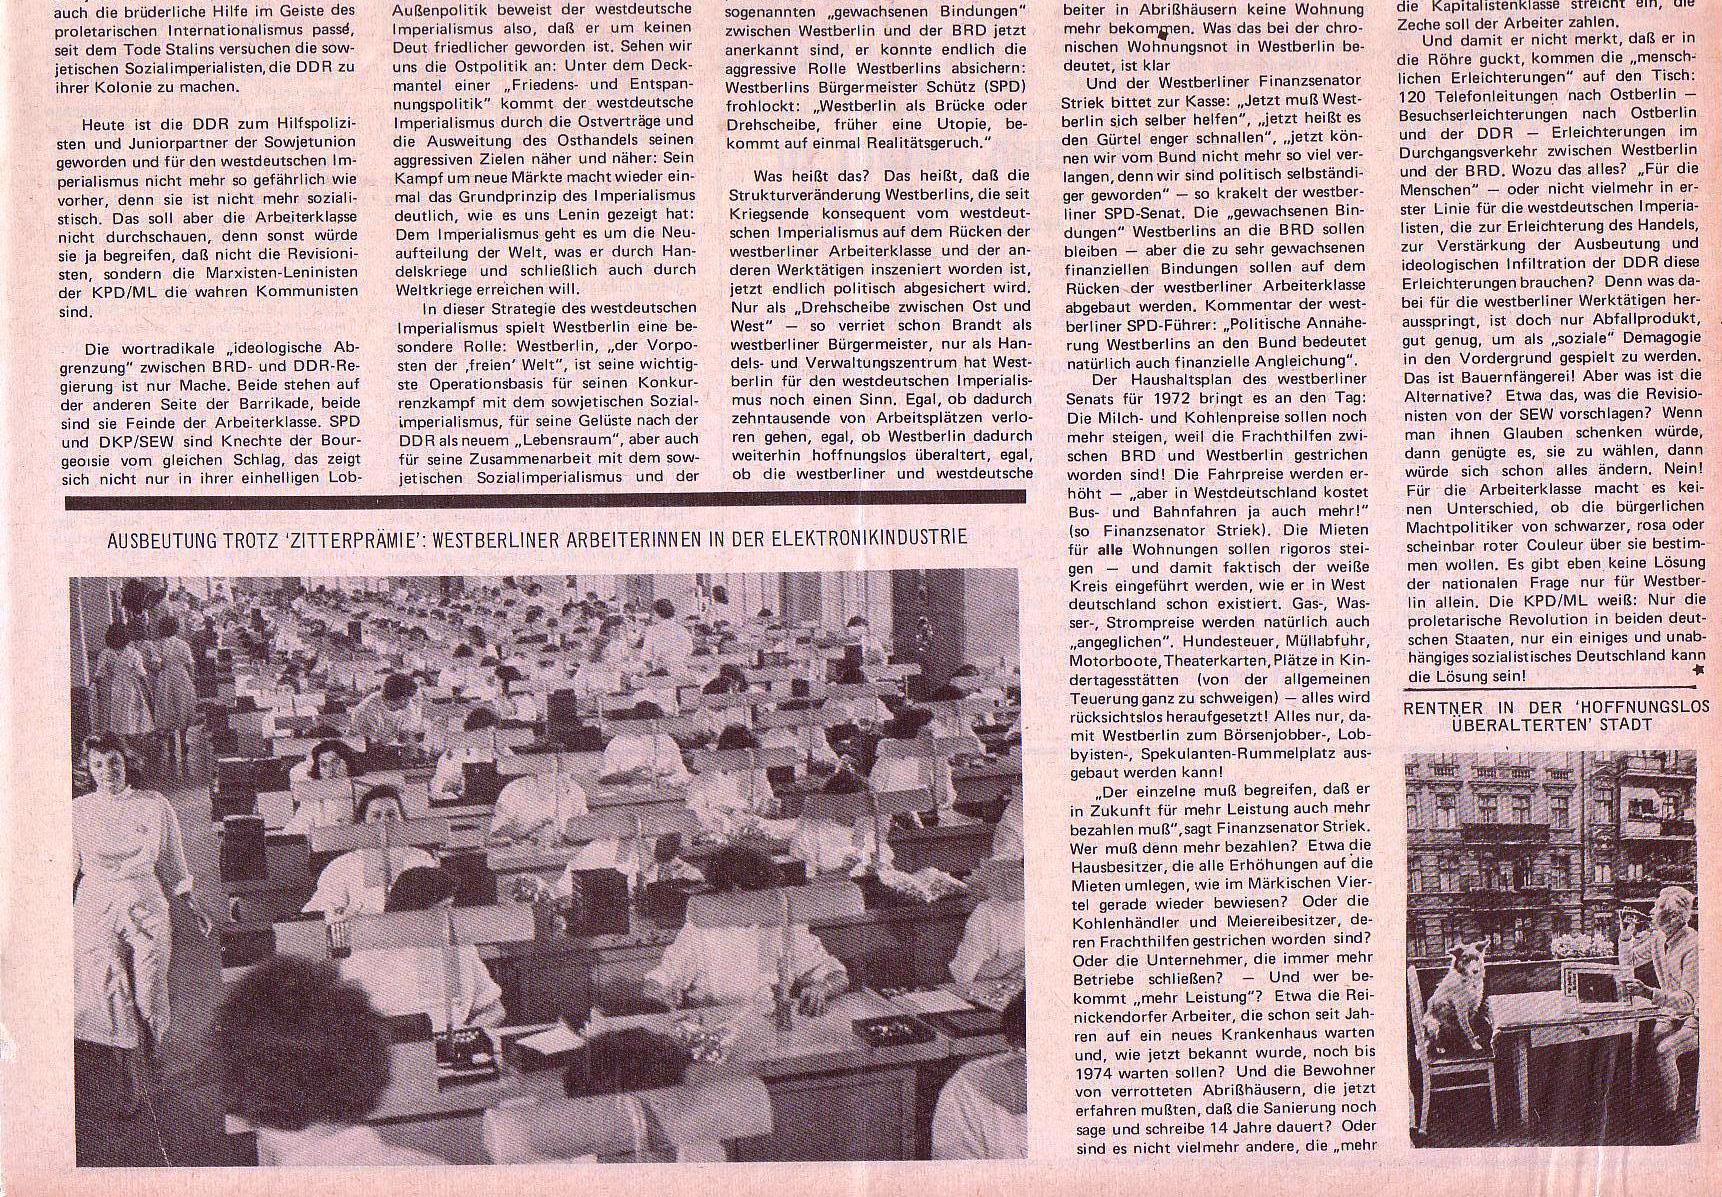 Roter Morgen, 5. Jg., 22. November 1971, Nr. 14, Seite 5b